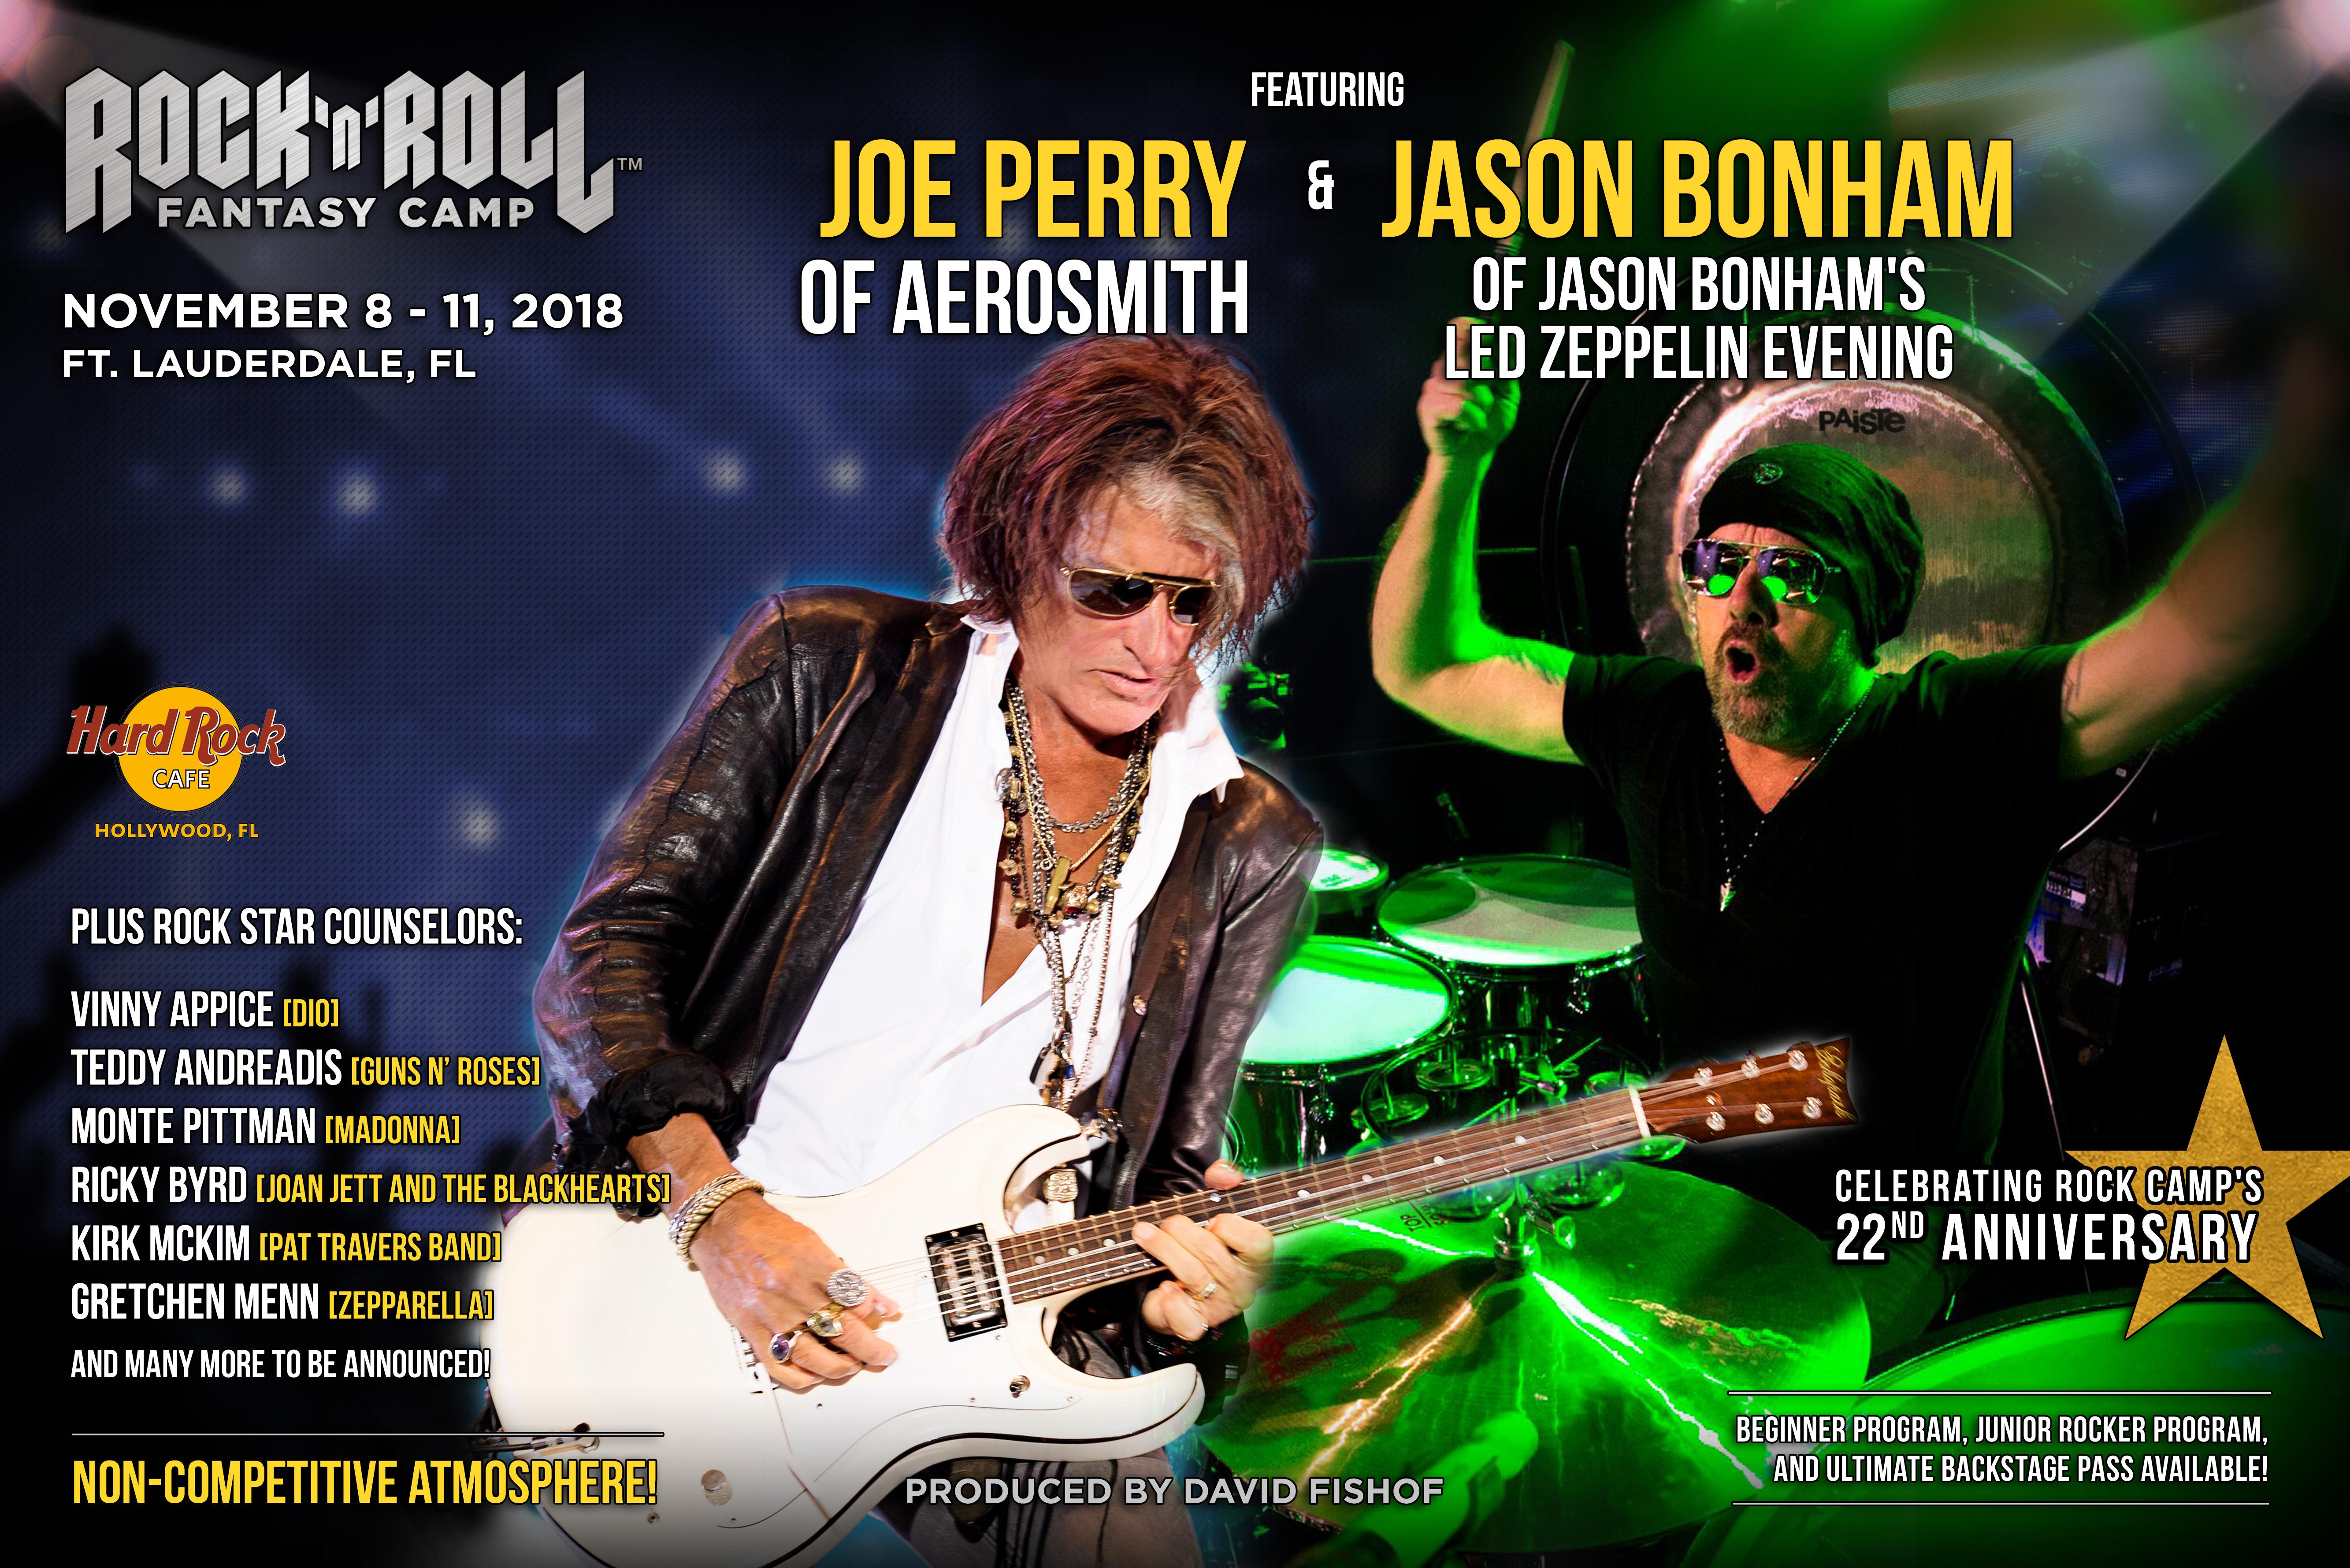 joe perry rock and roll fantasy camp joe perry